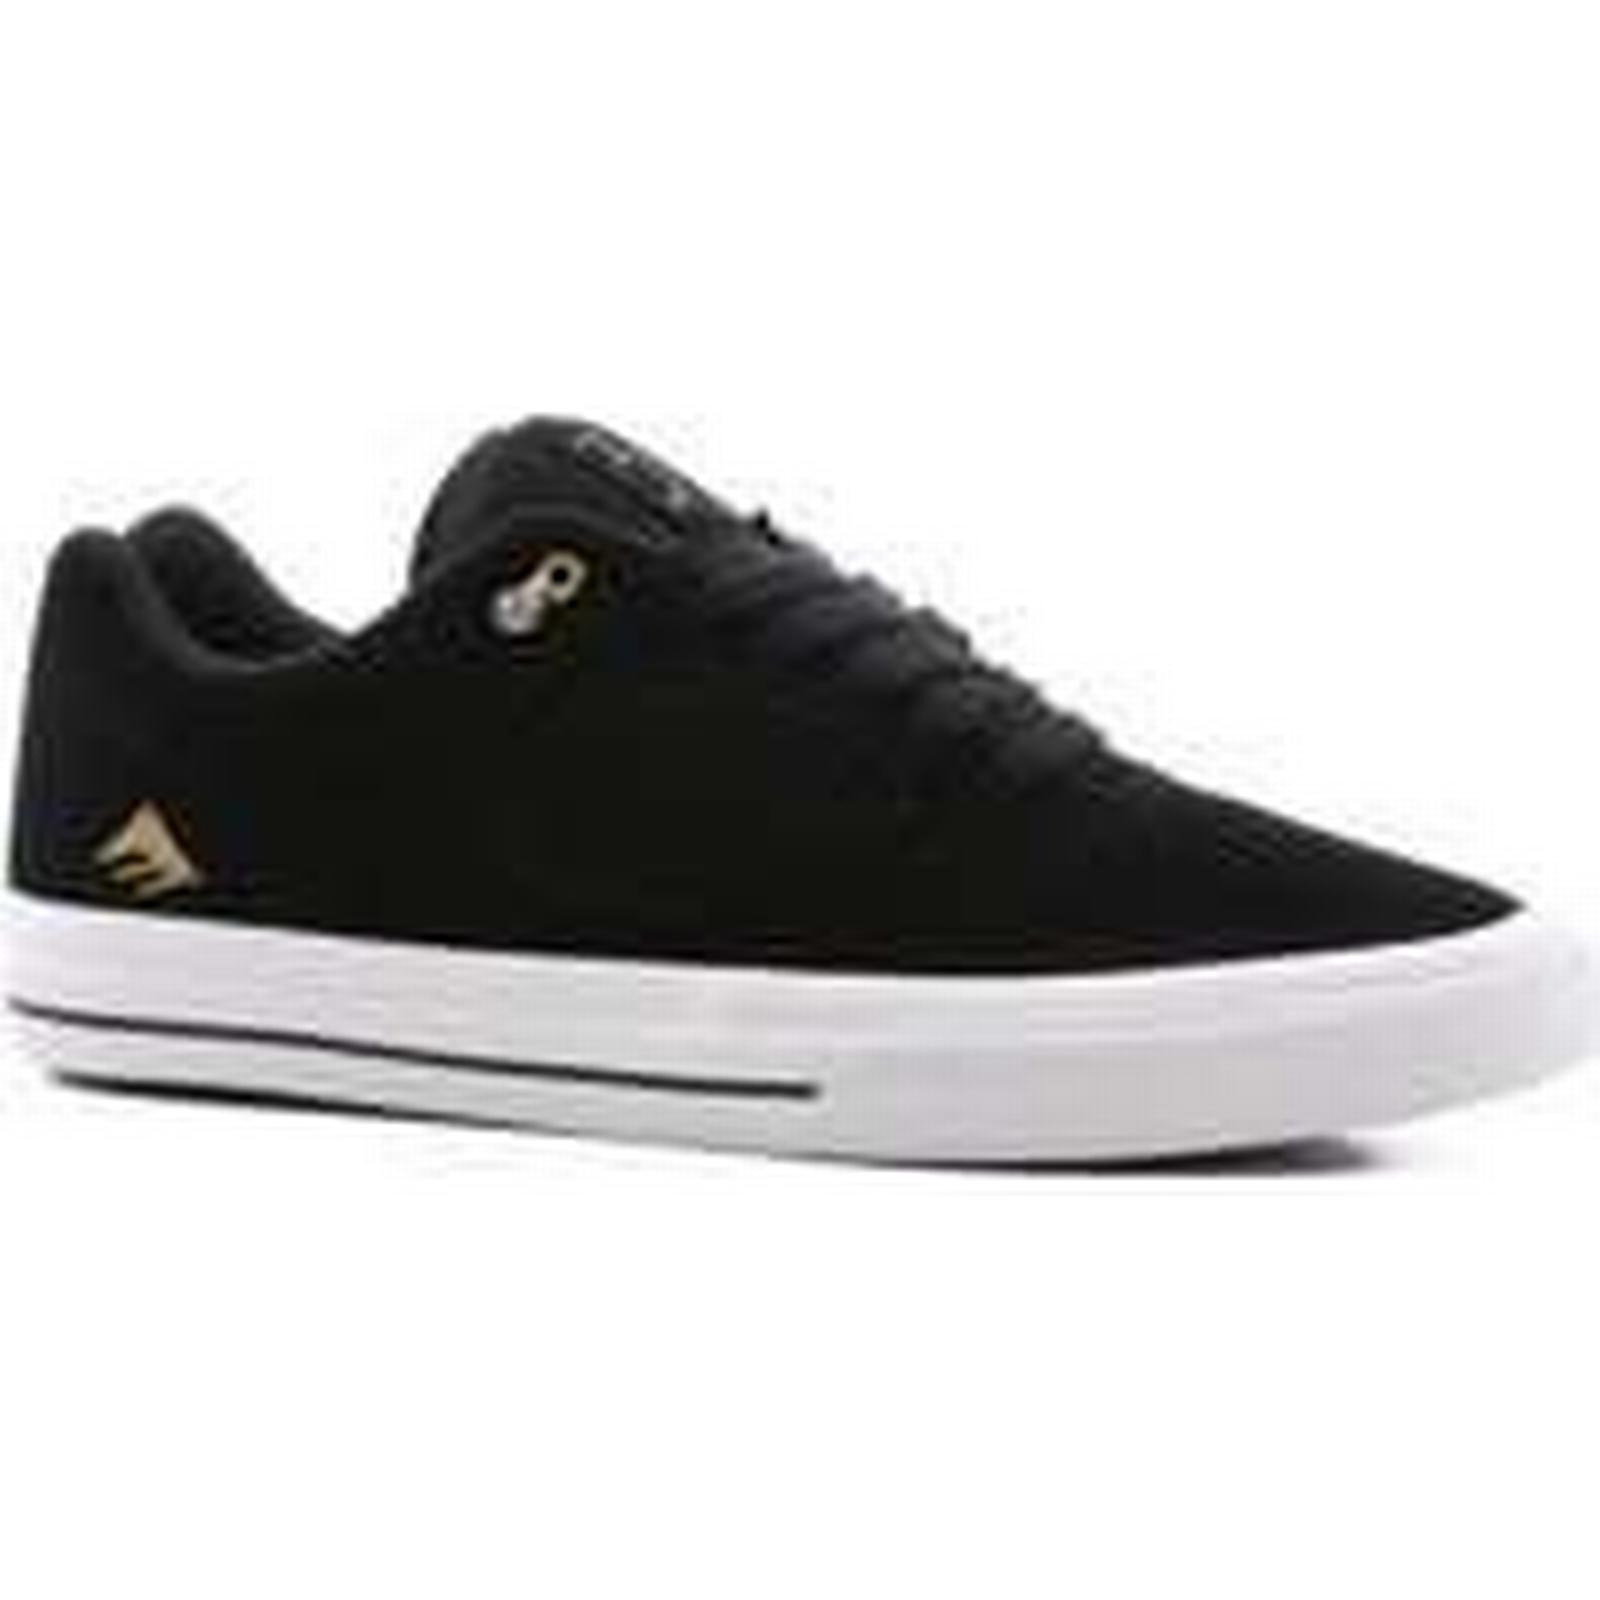 Emerica Reynolds 3 Shoes G6 Vulc Skate Shoes 3 black/white/gold 347da4